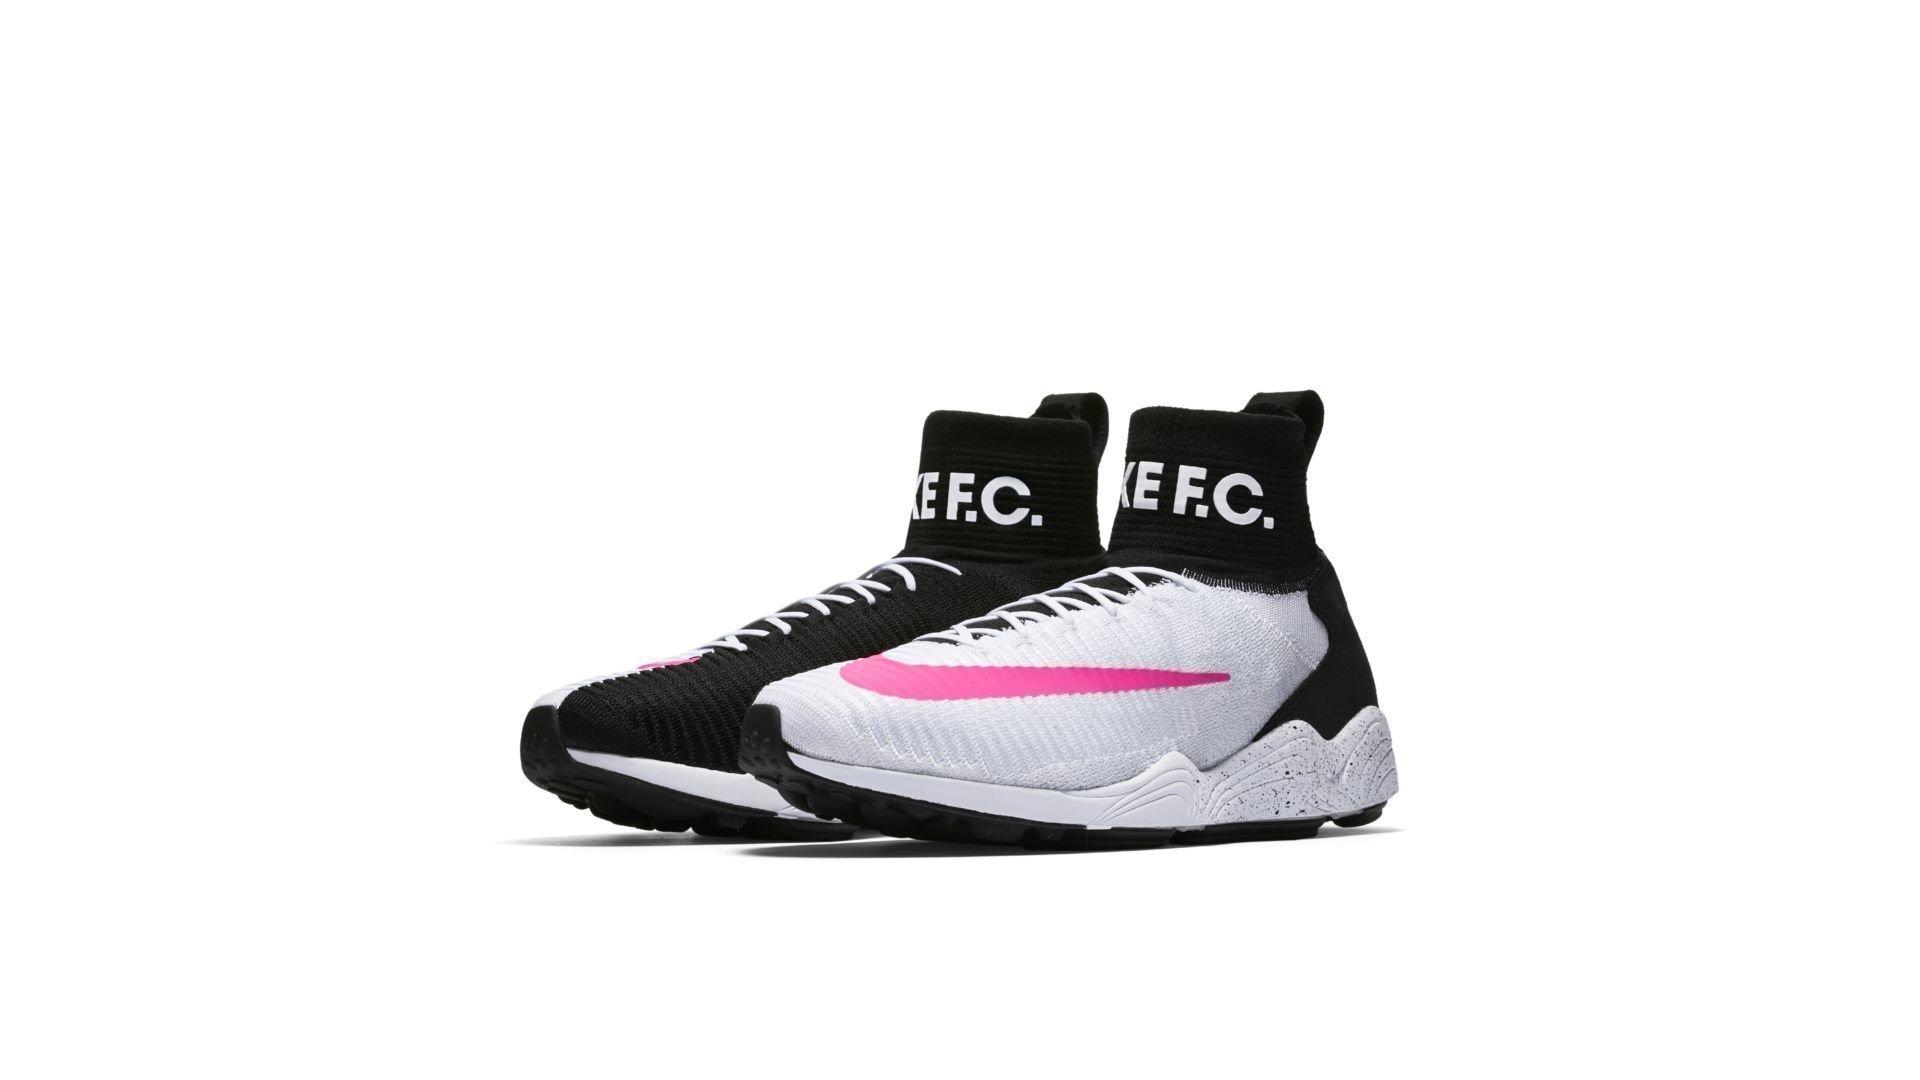 Nike Mercurial Flyknit FC White Black Pink Blast (852616-100)